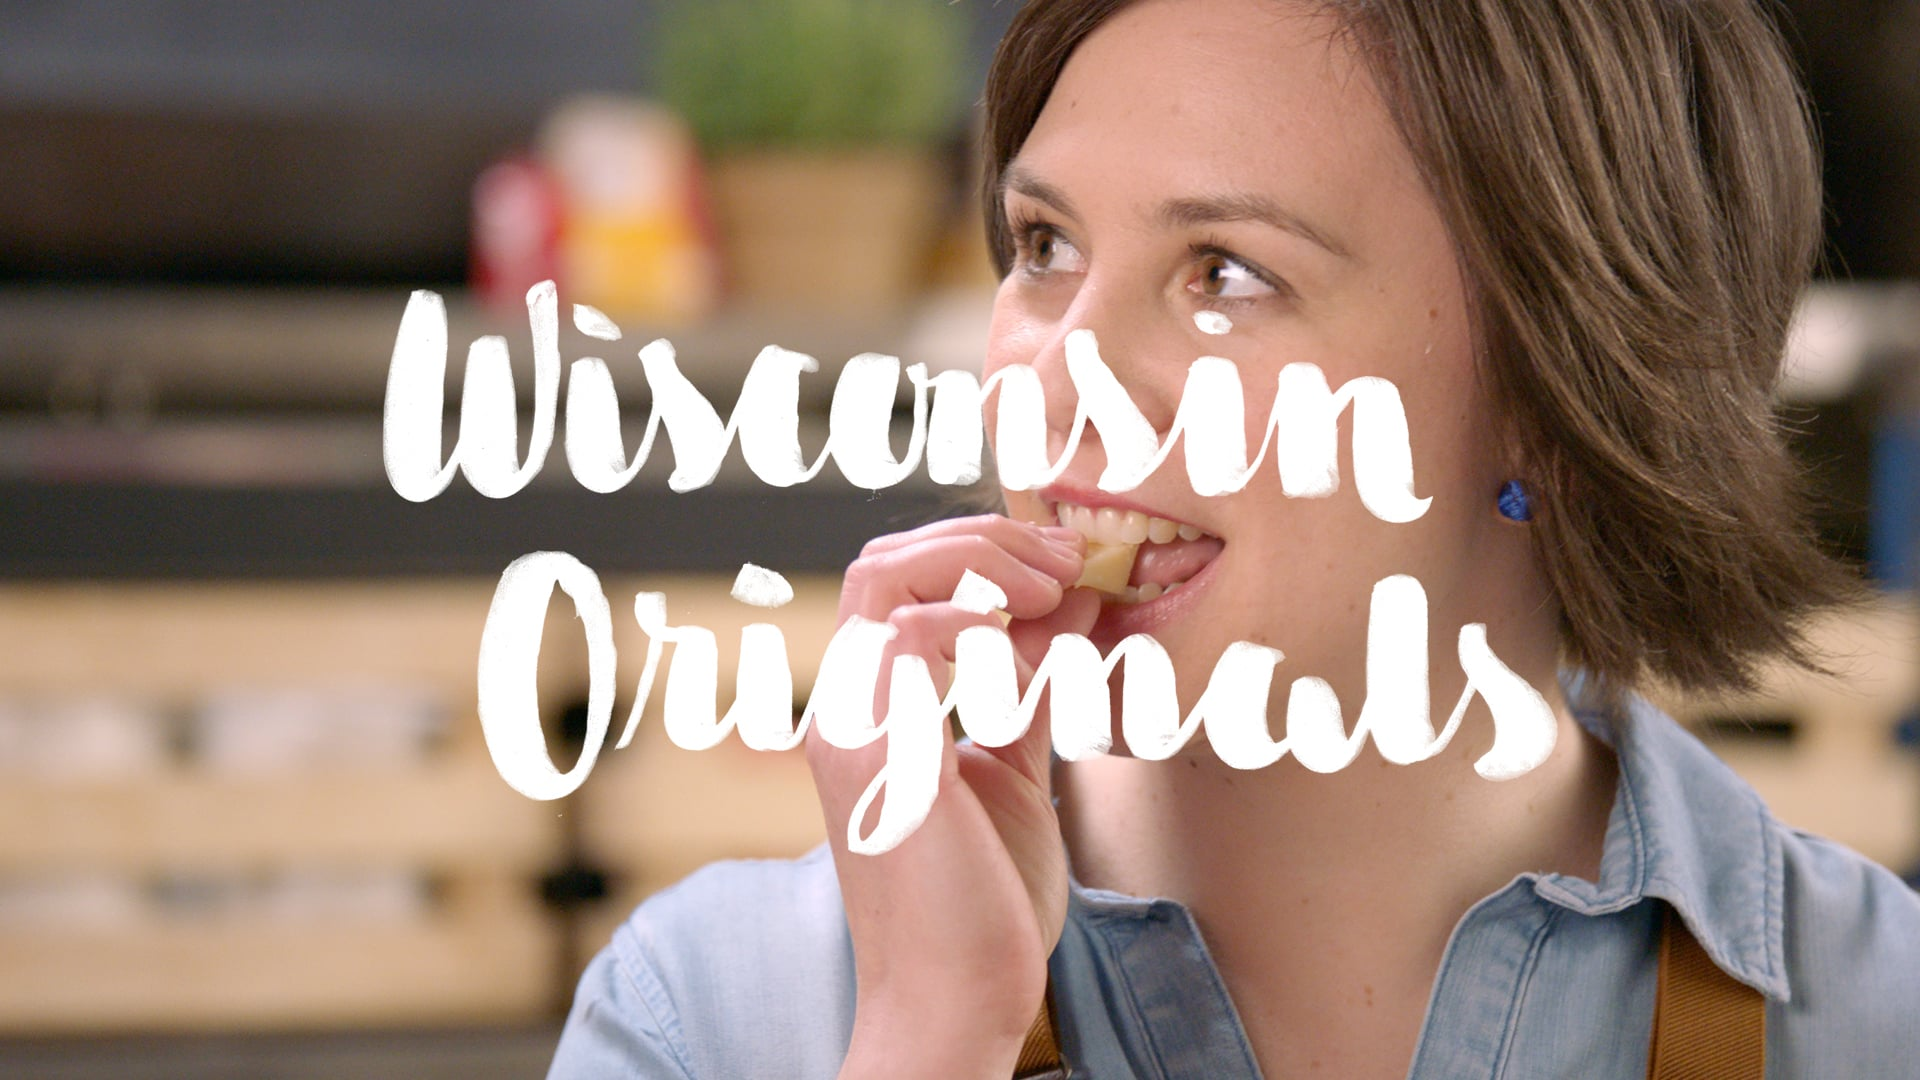 State of Cheese | Wisconsin Originals